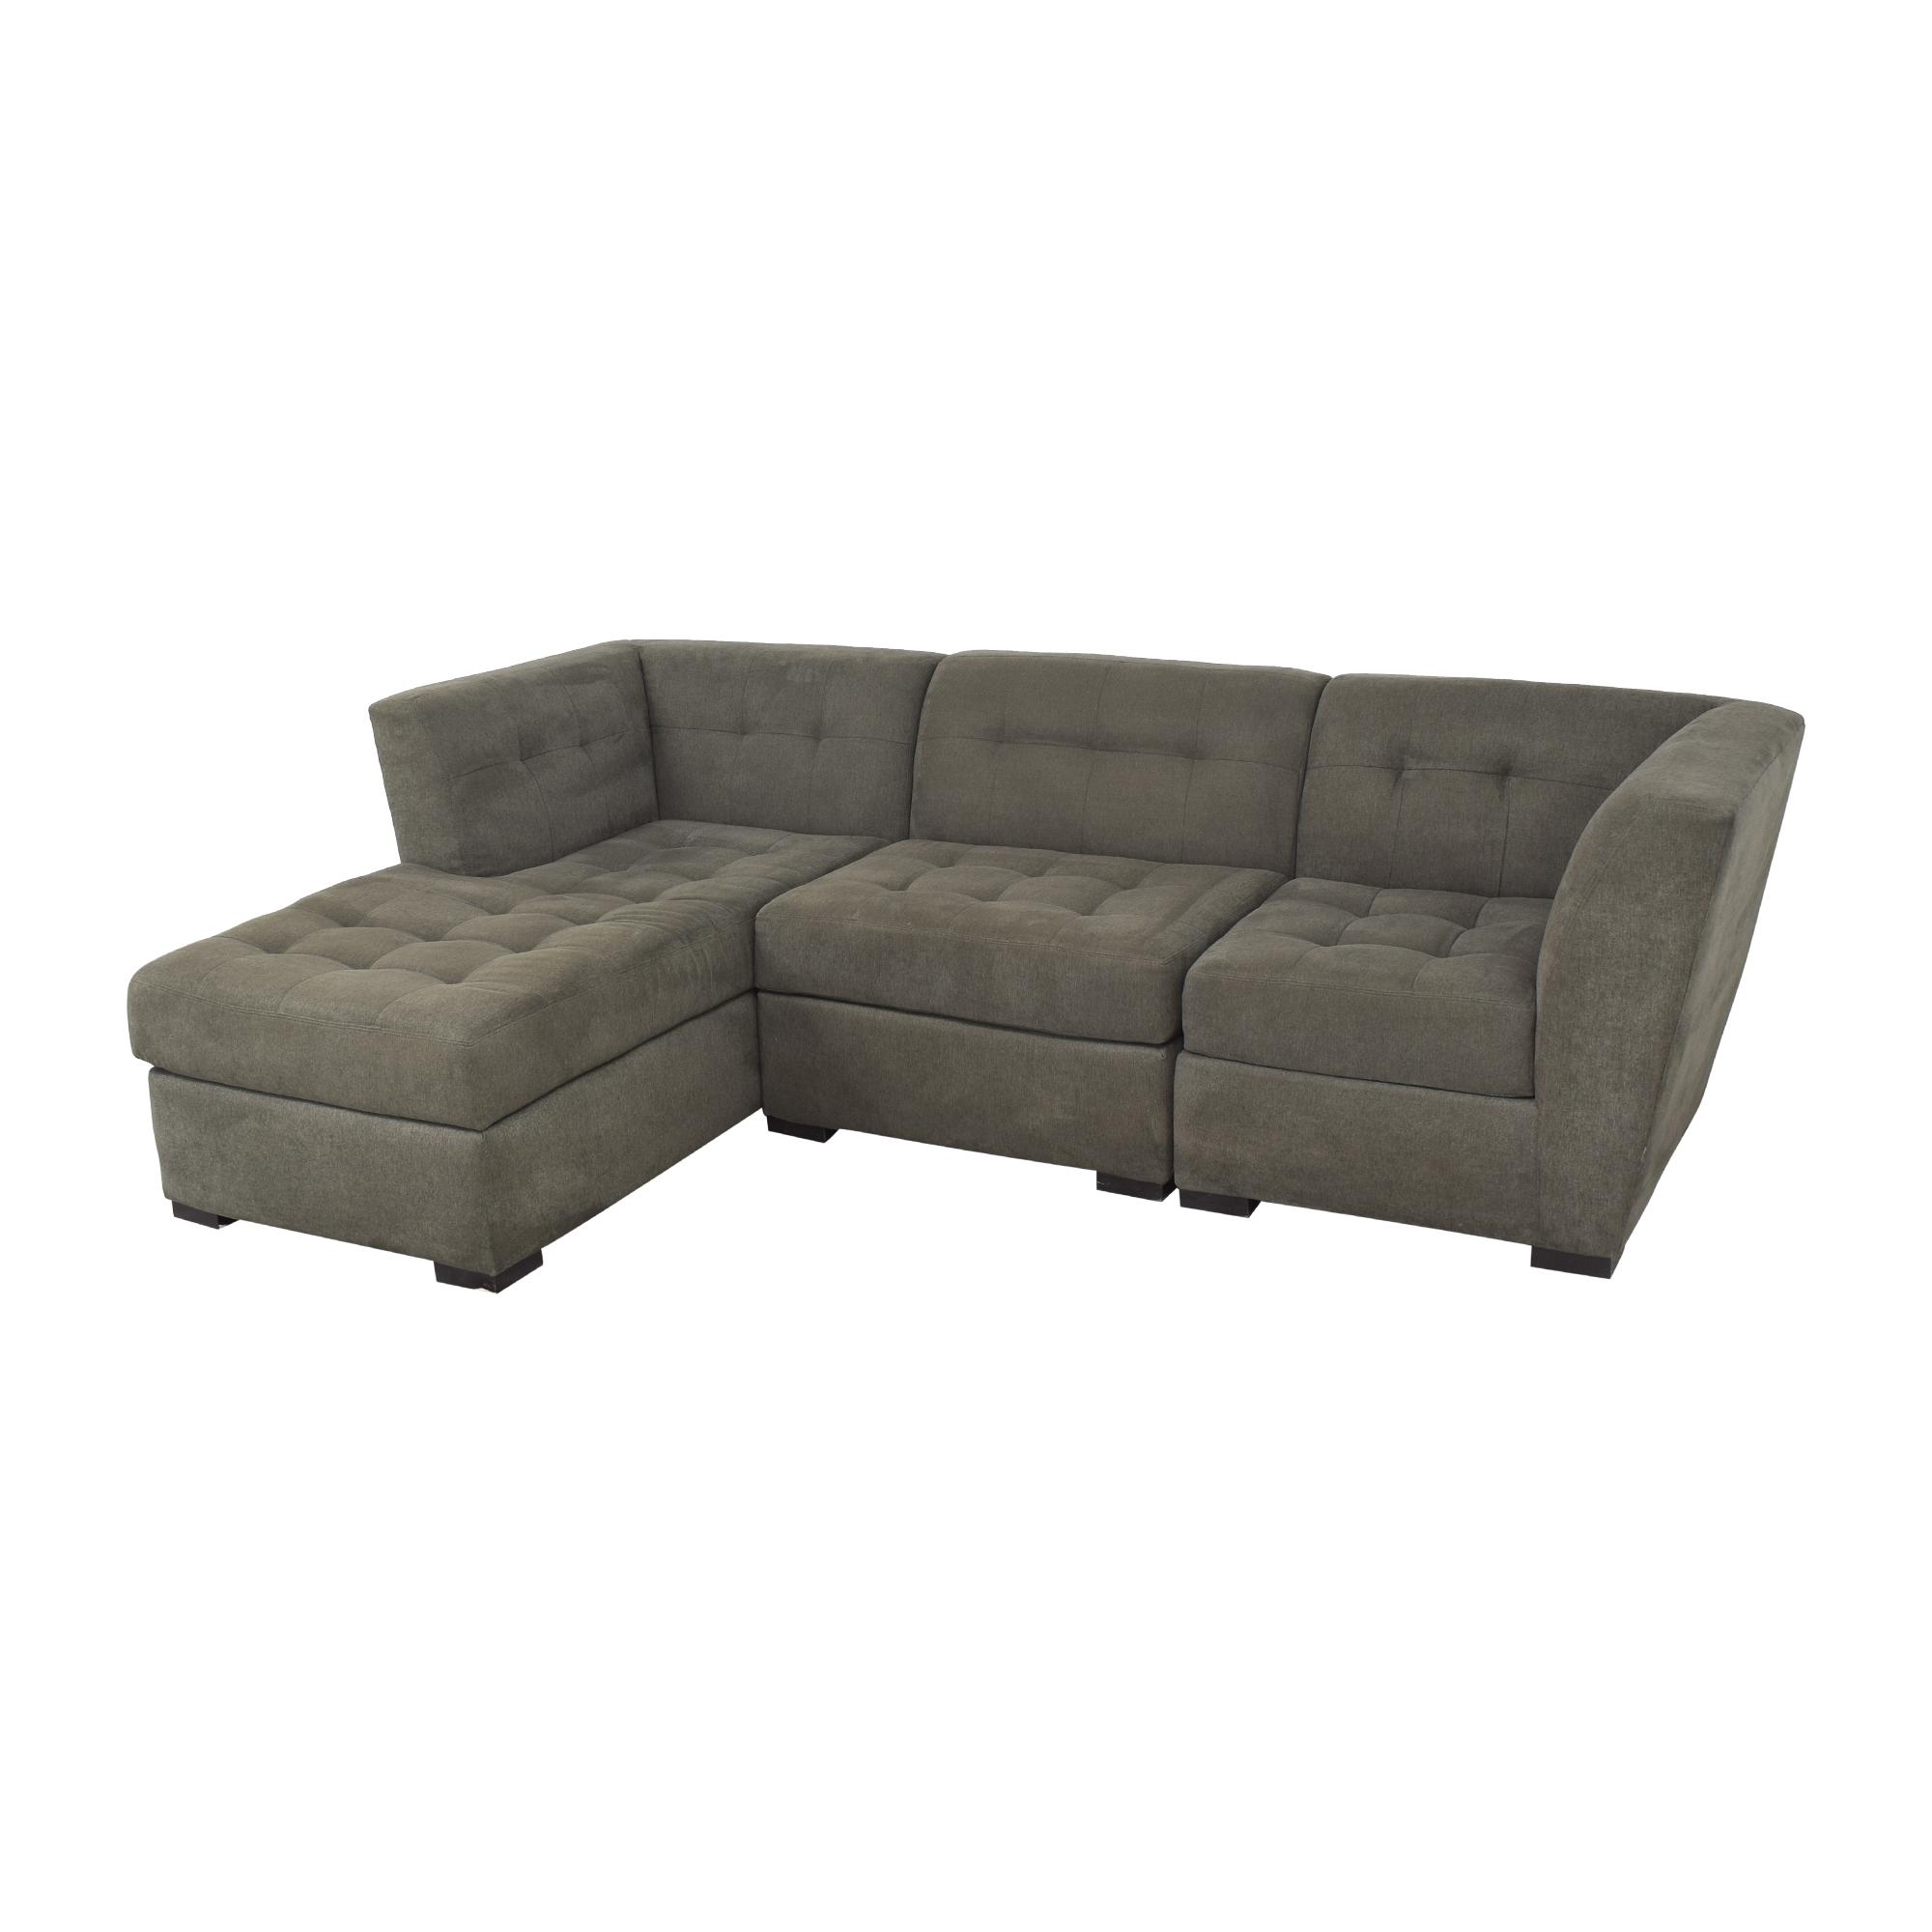 Macy's Macy's Roxanne II Chaise Sectional Sofa nj